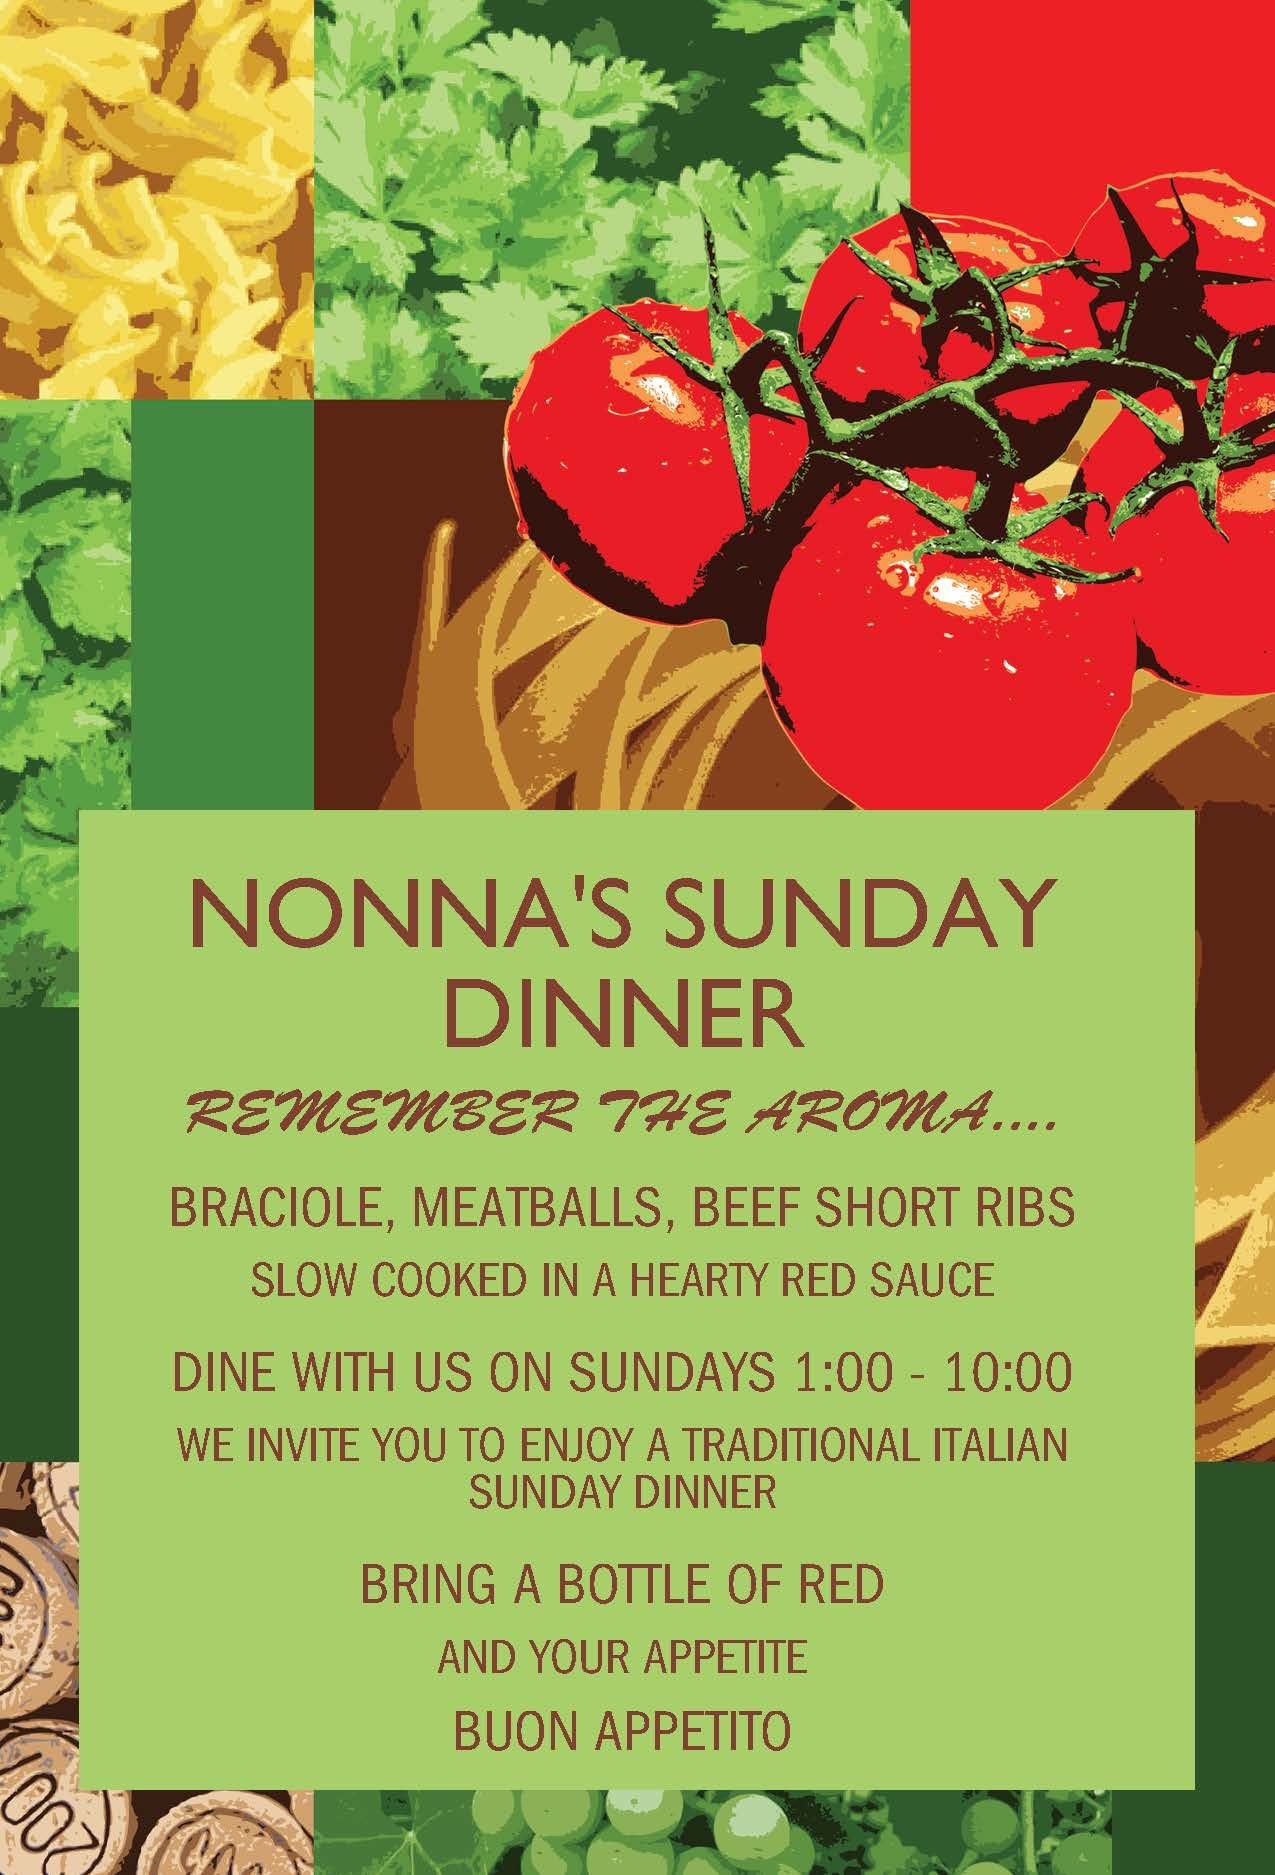 Ristorante Aroma - Nonna's Sunday Dinner